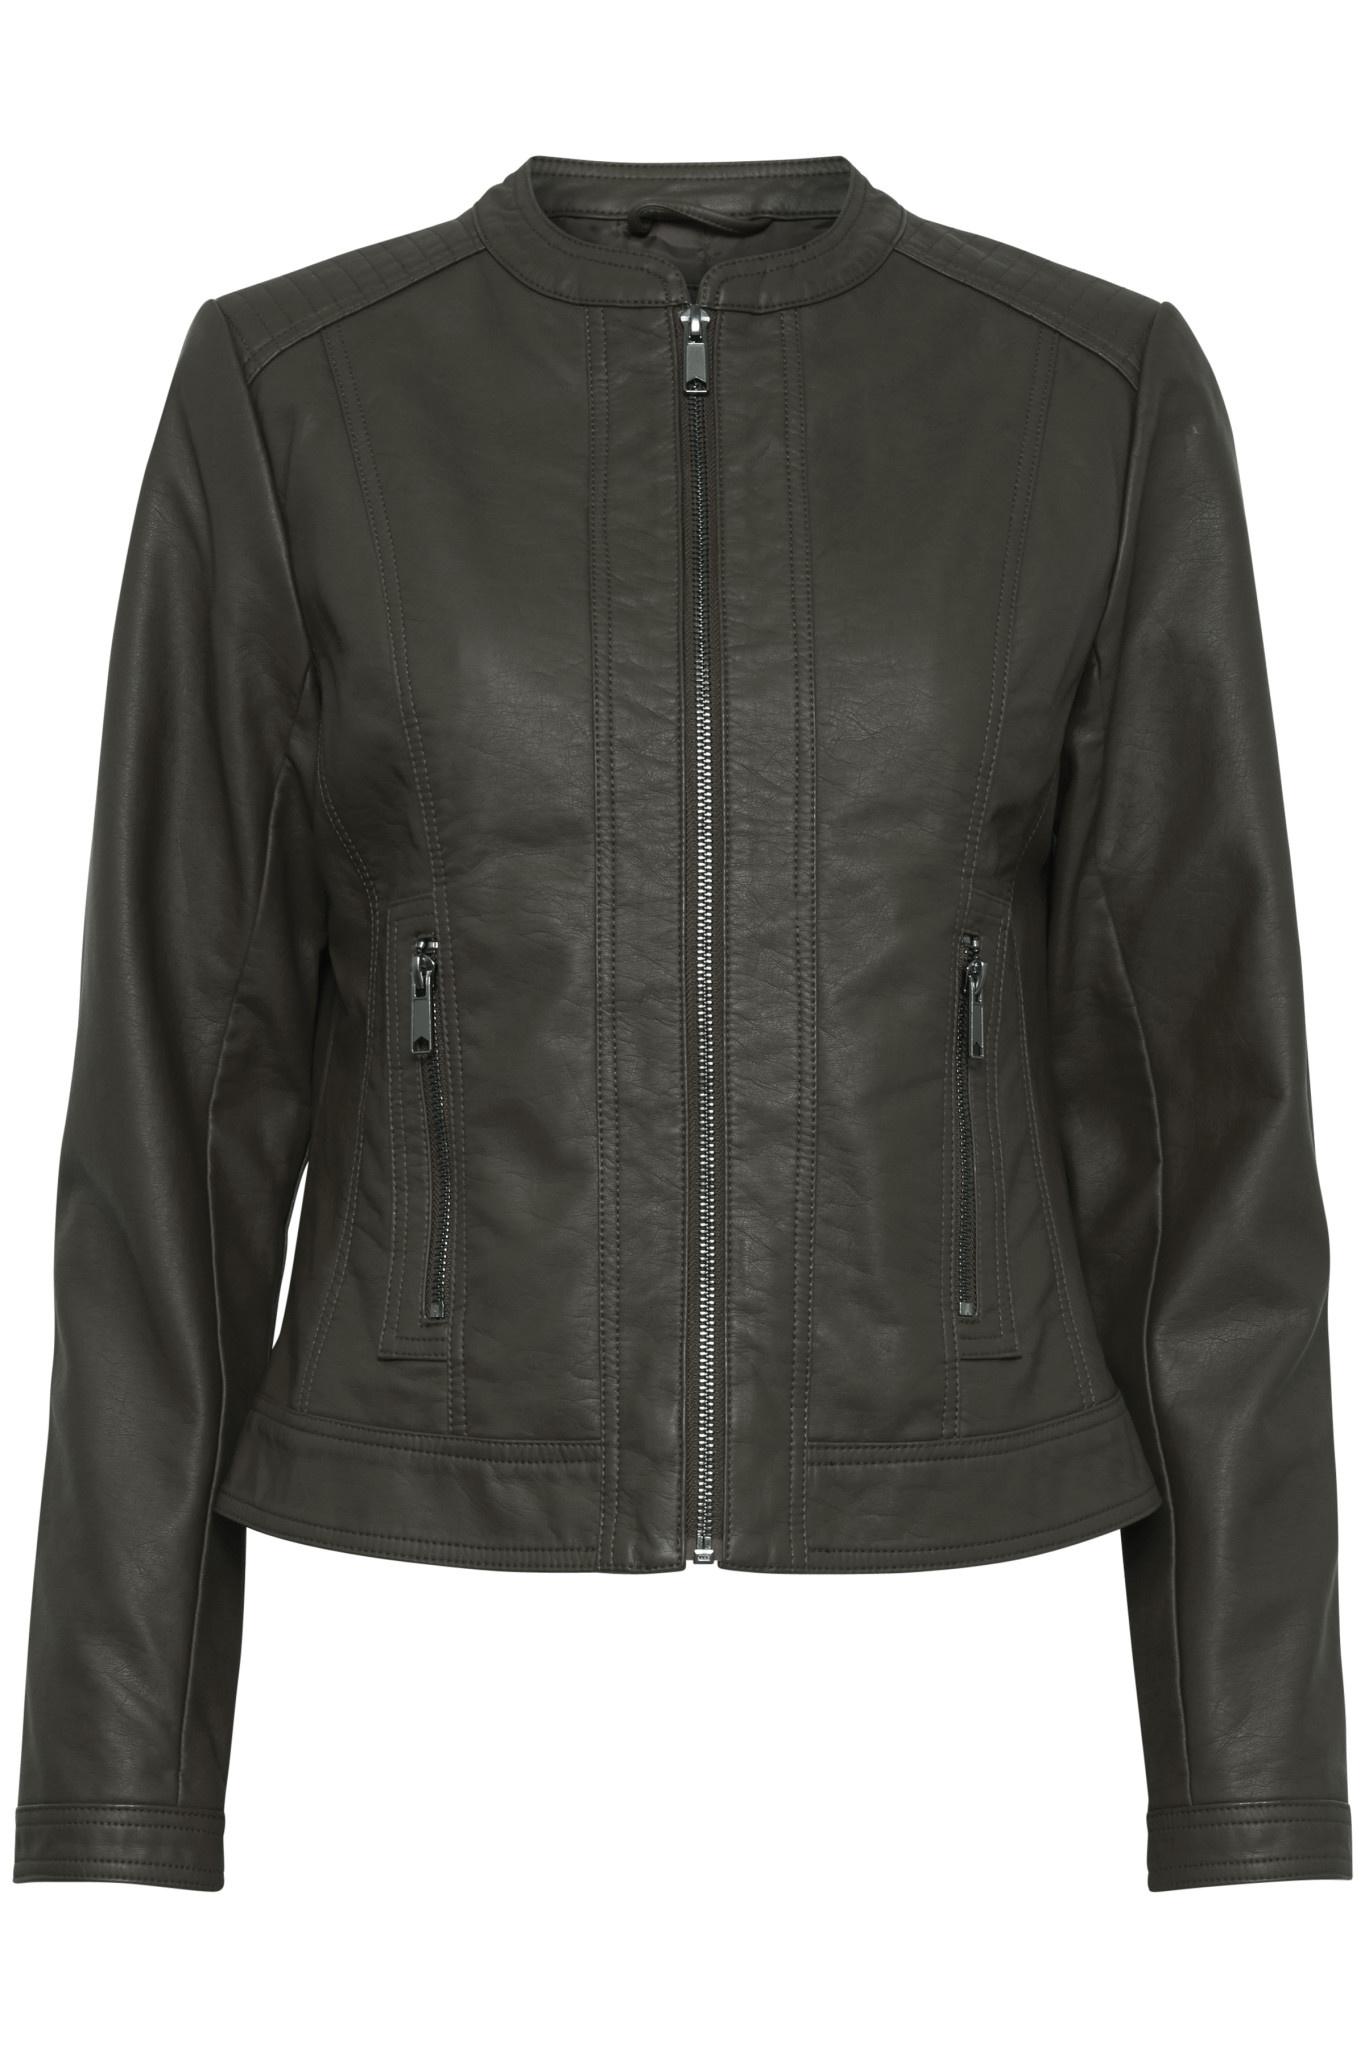 Acom Jacket